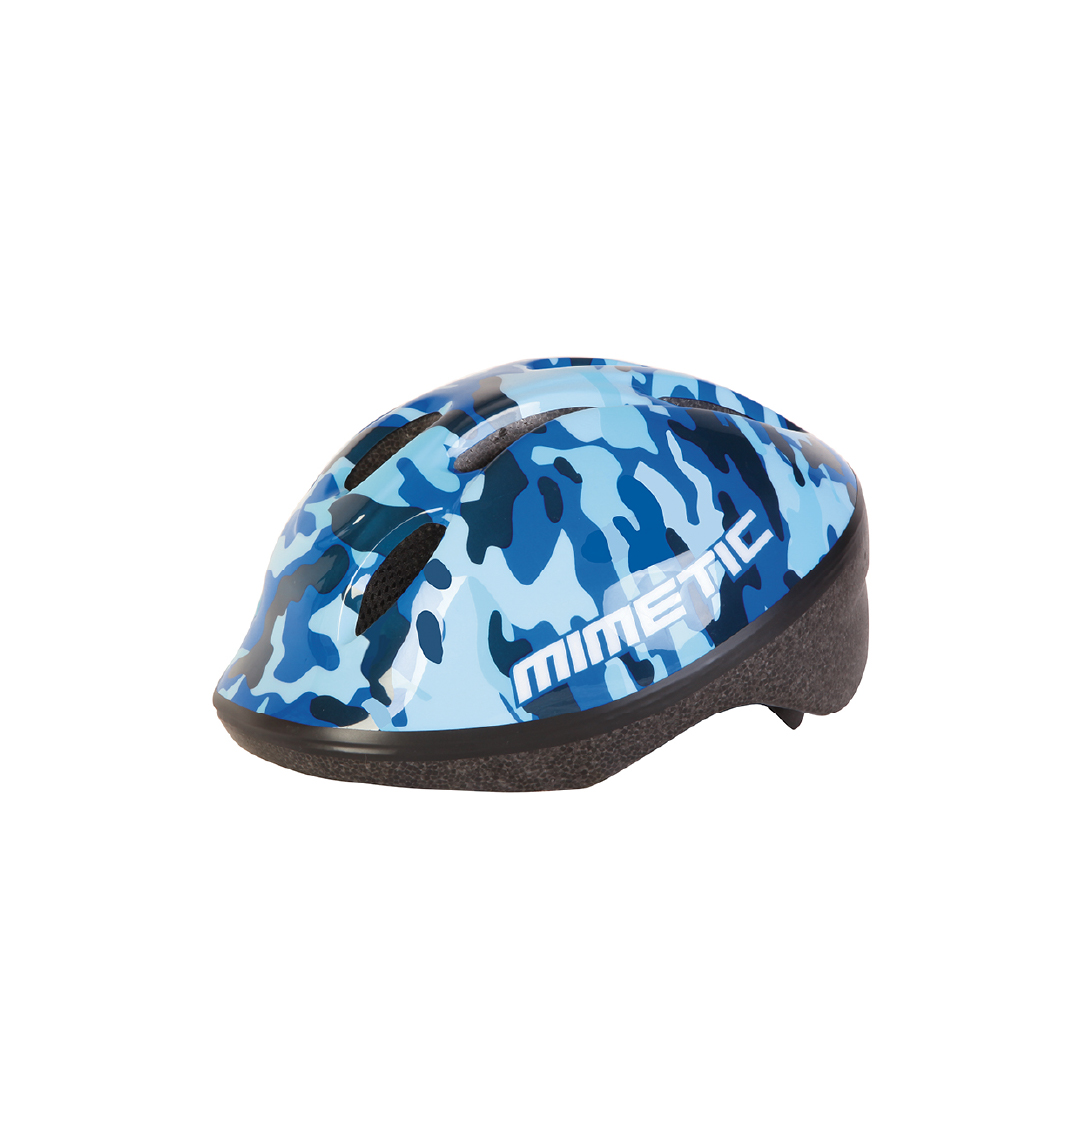 HELMET MIMETIC BLUE-2